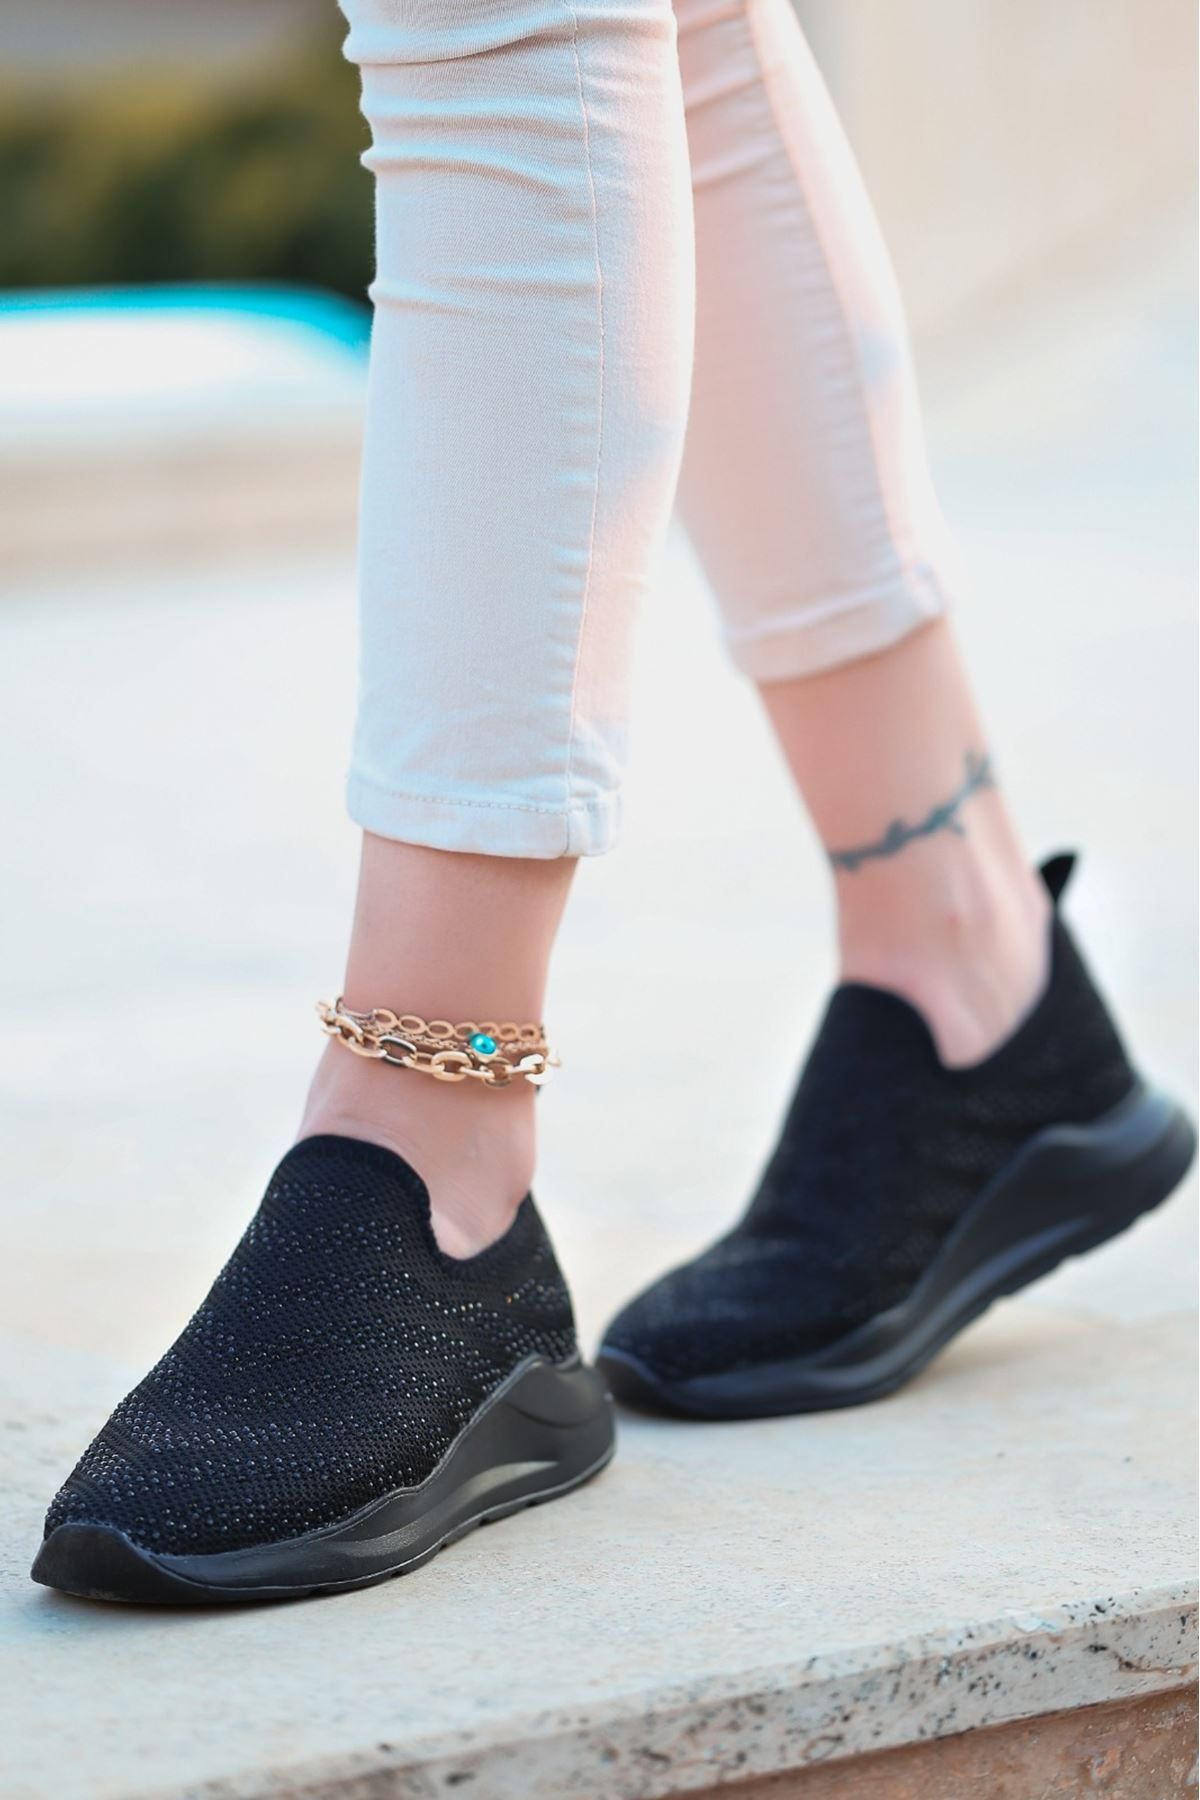 Tiger Taş Detaylı Siyah Triko Kadın Spor Ayakkabı